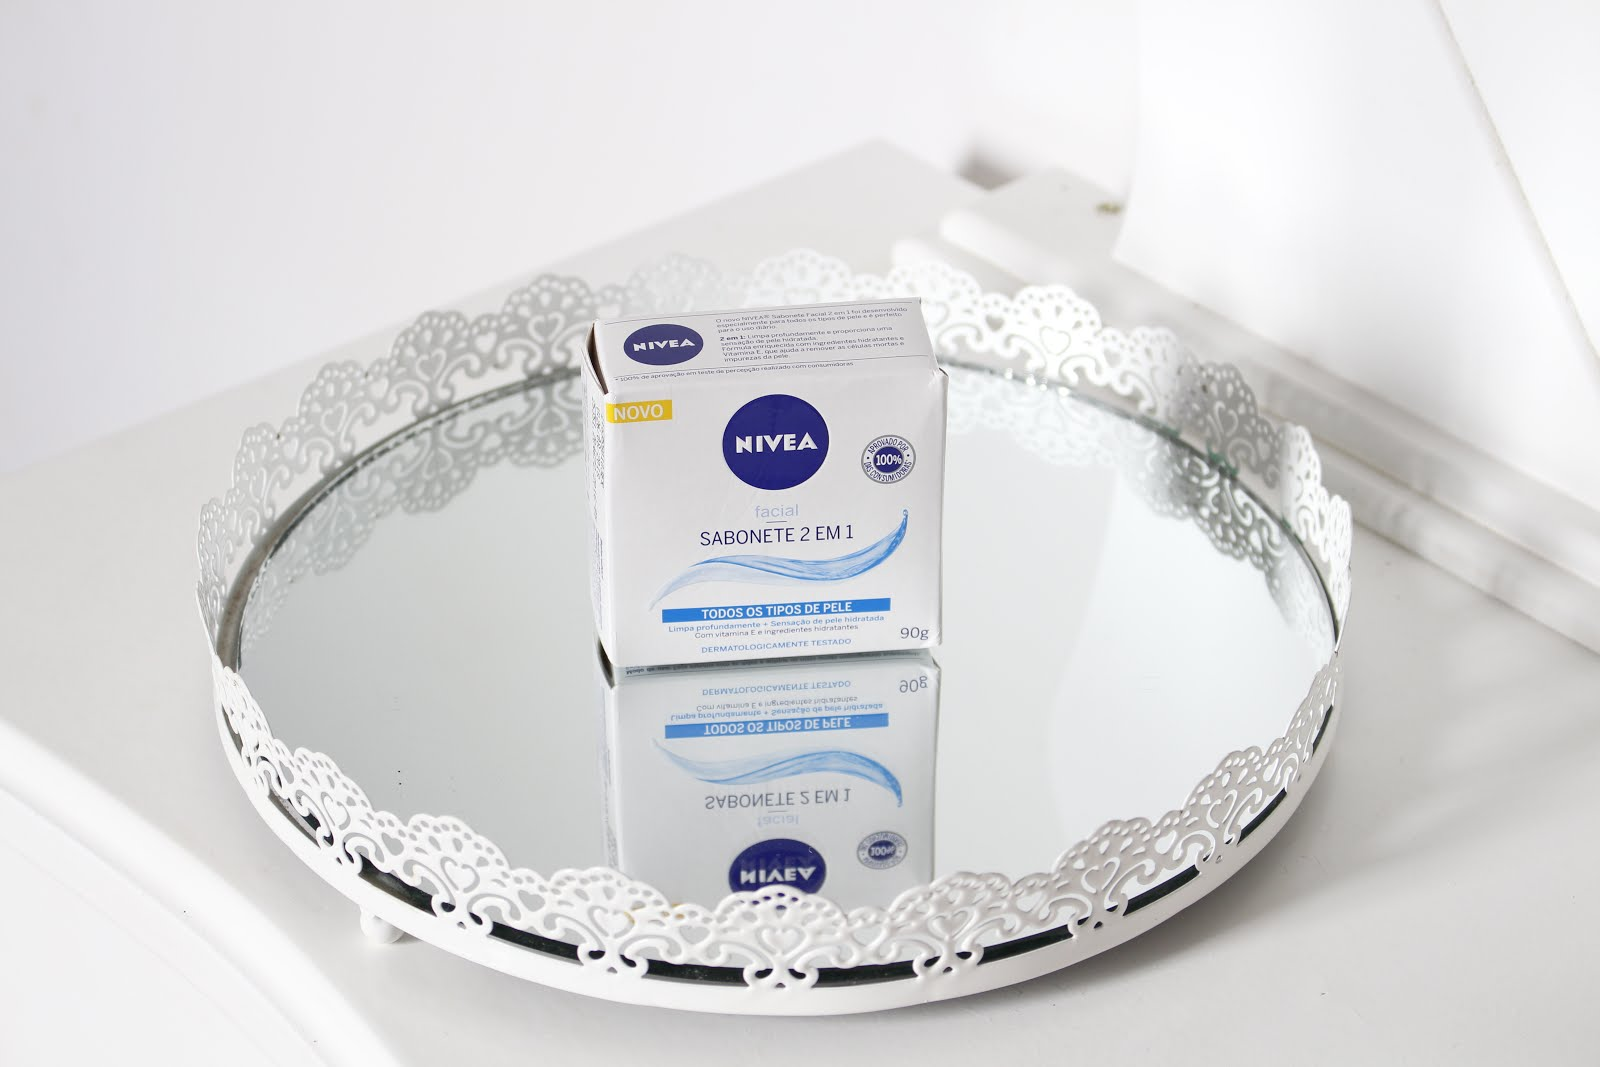 Nivea sabonete facial 2 em 1 - Blog Cris Felix